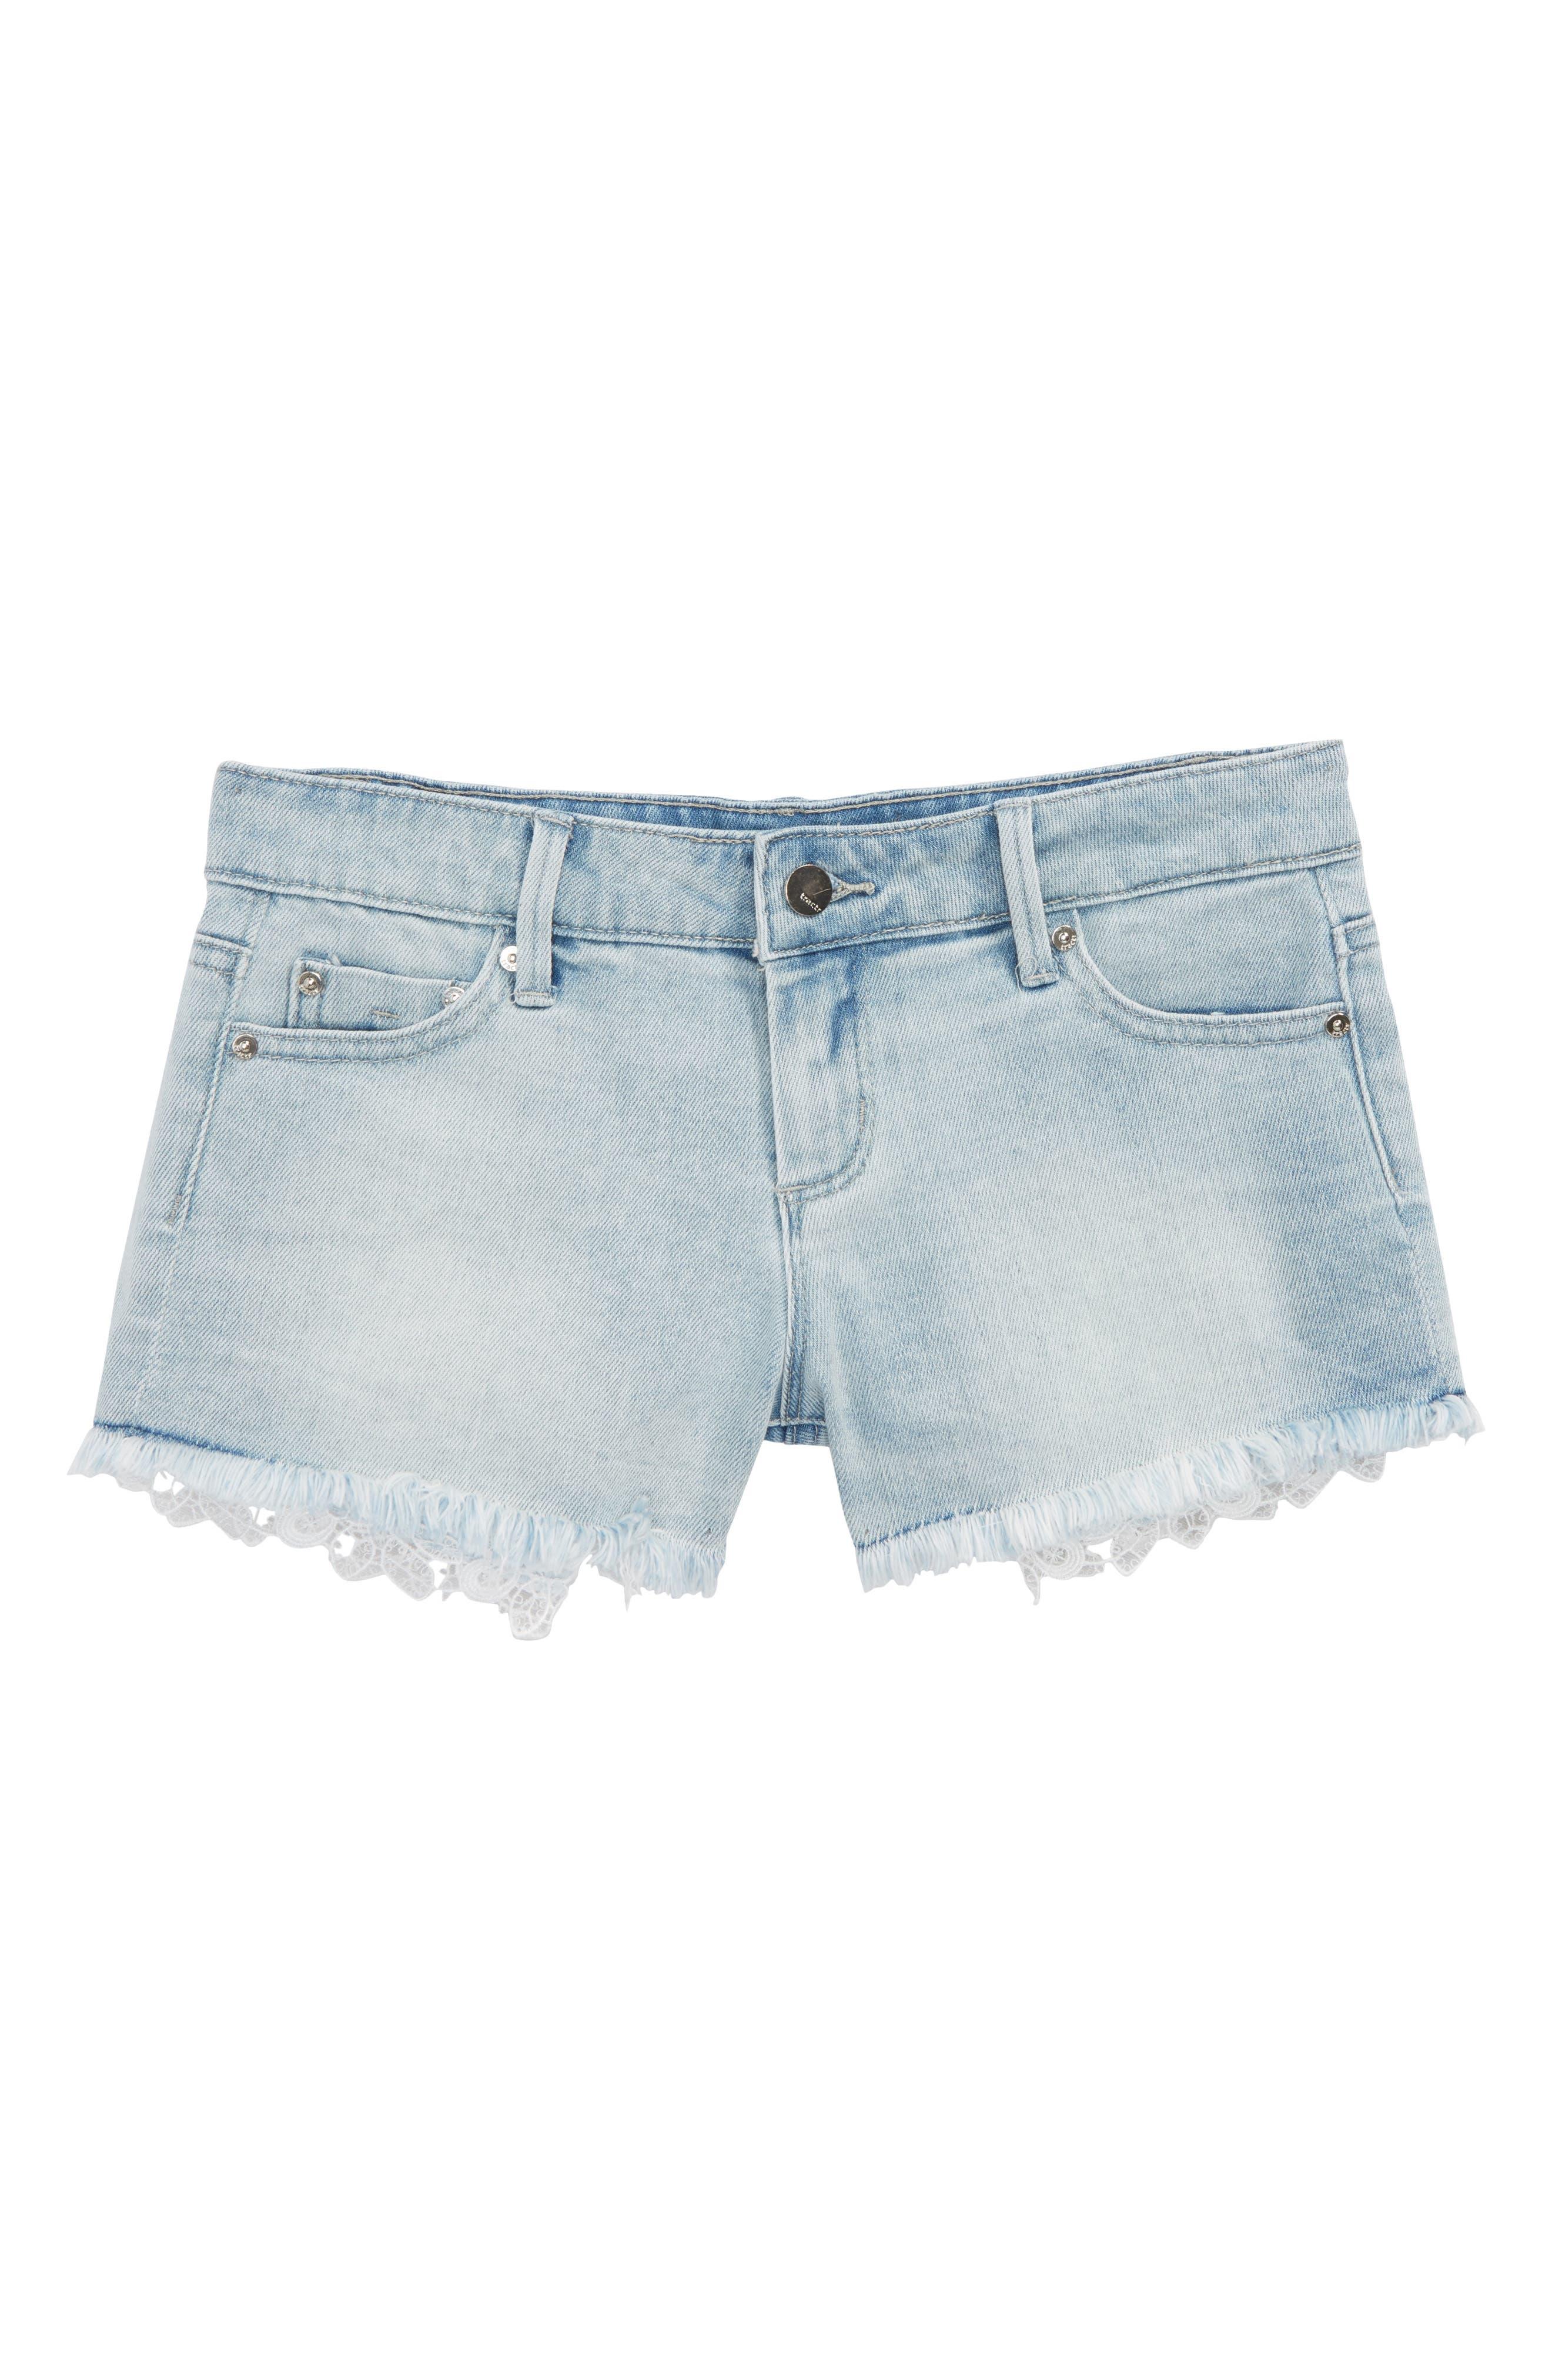 Lace Denim Shorts,                             Main thumbnail 1, color,                             Light Indigo